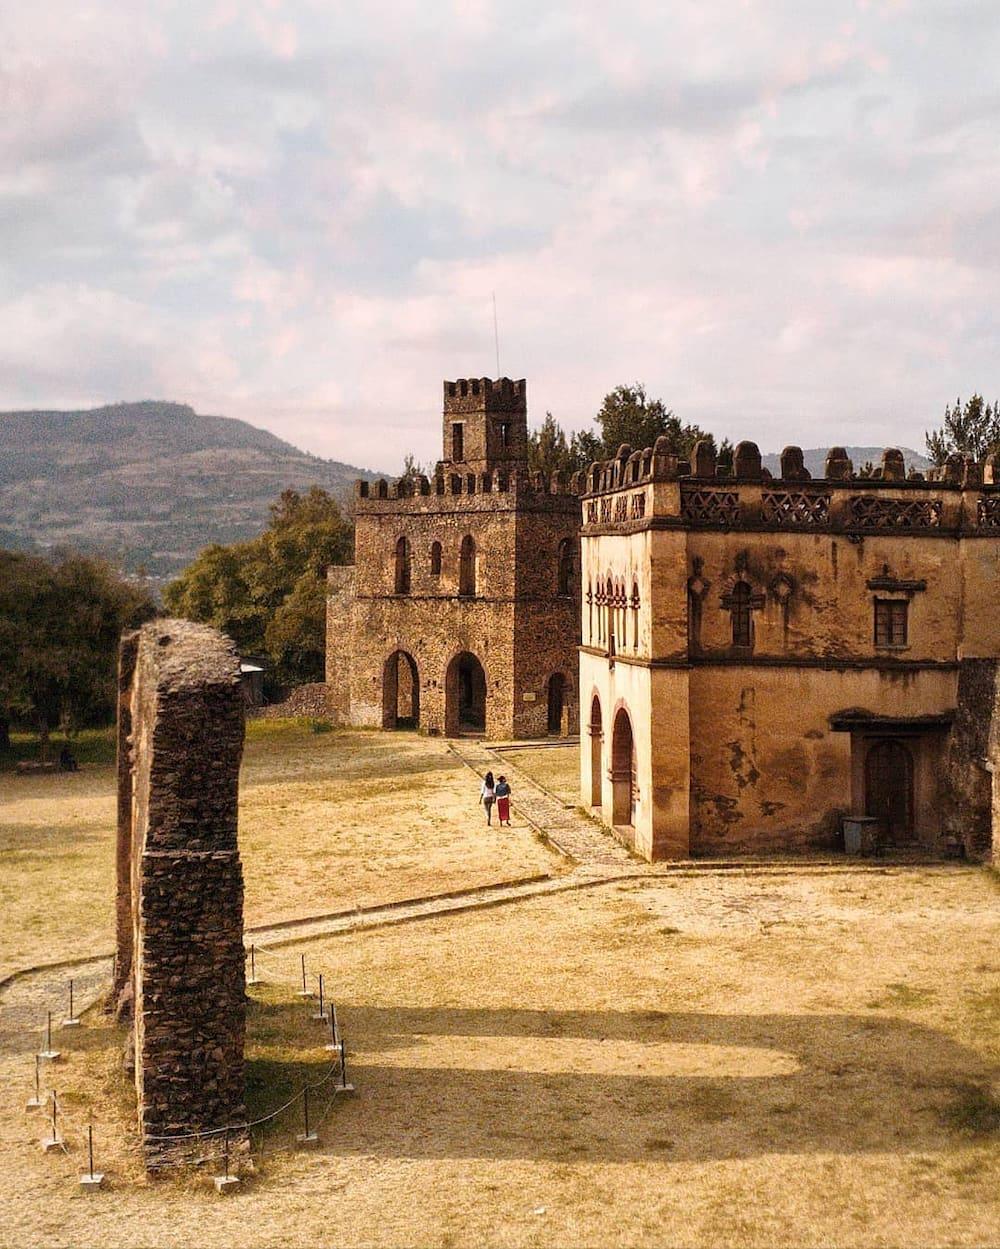 Best castles in Africa